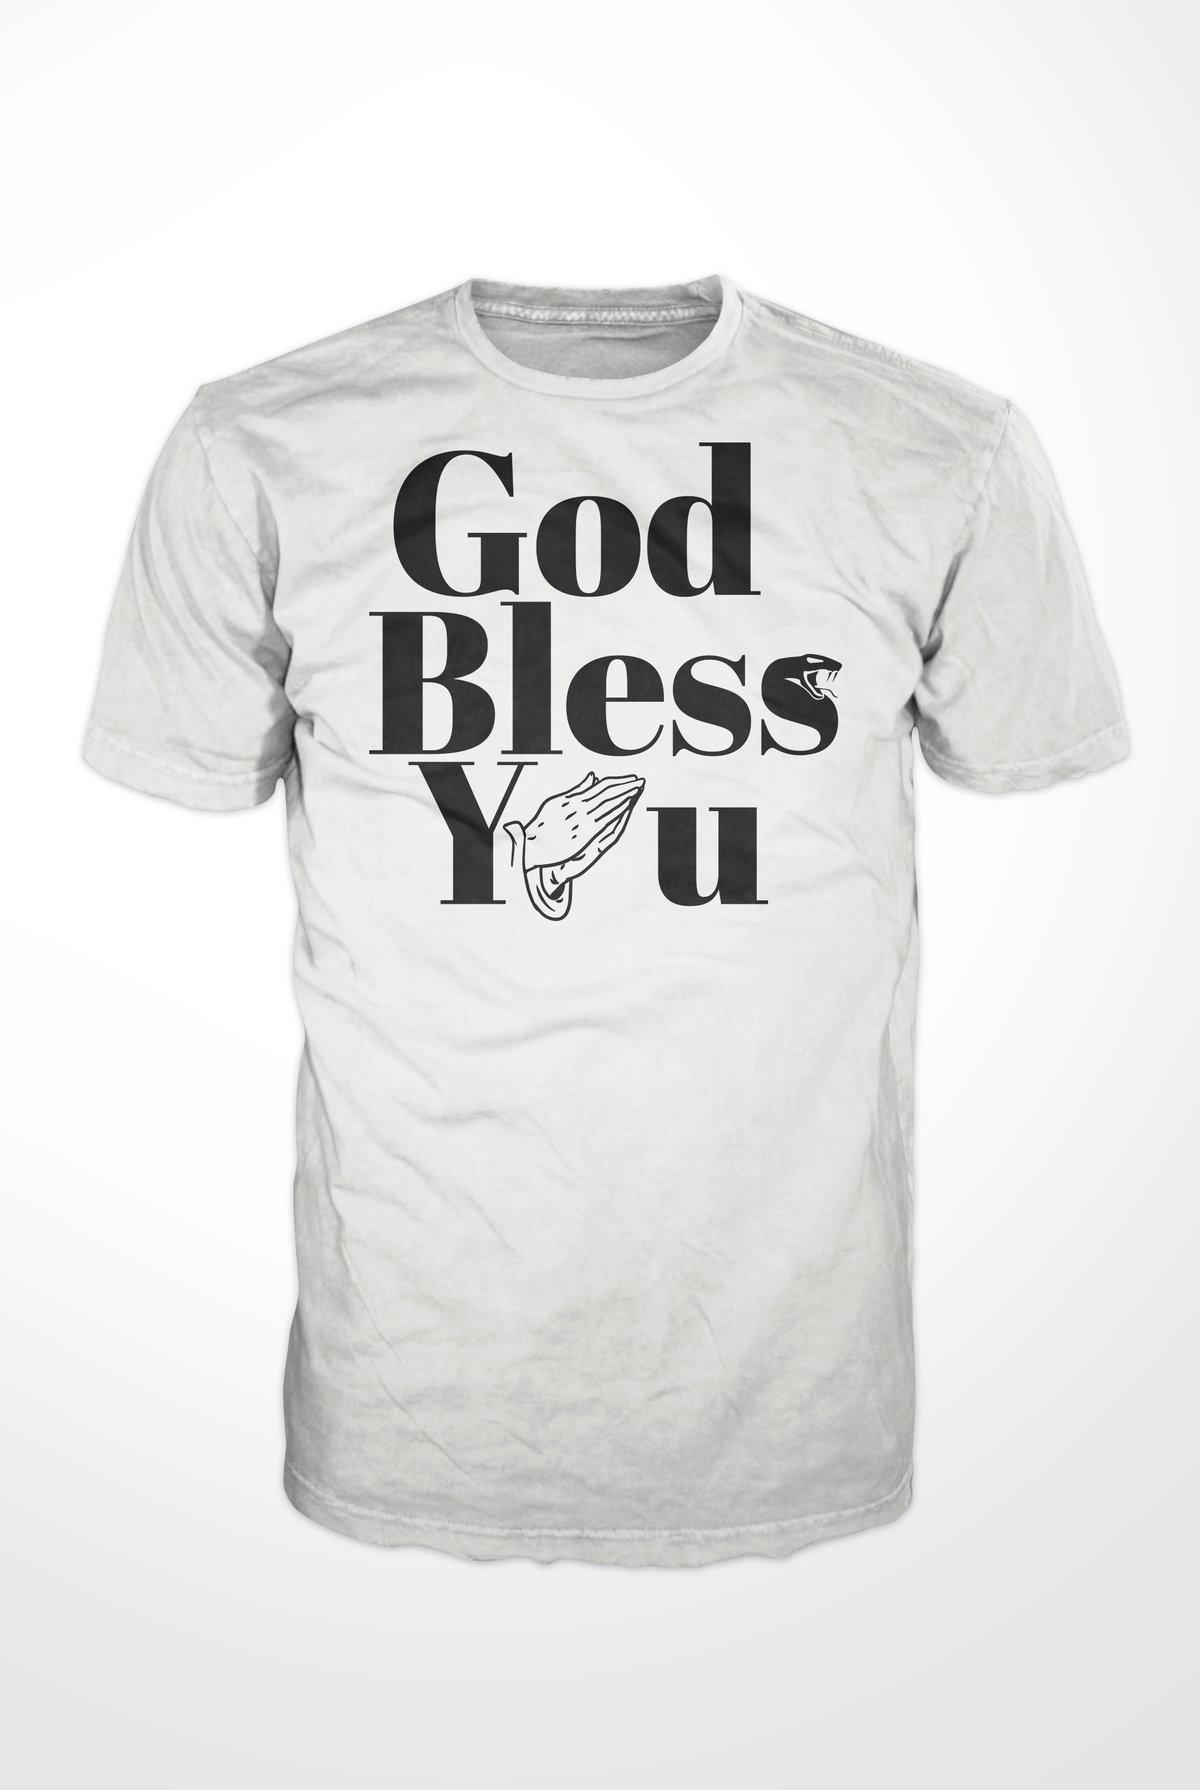 Image of GOD BLESS YOU T-Shirt White